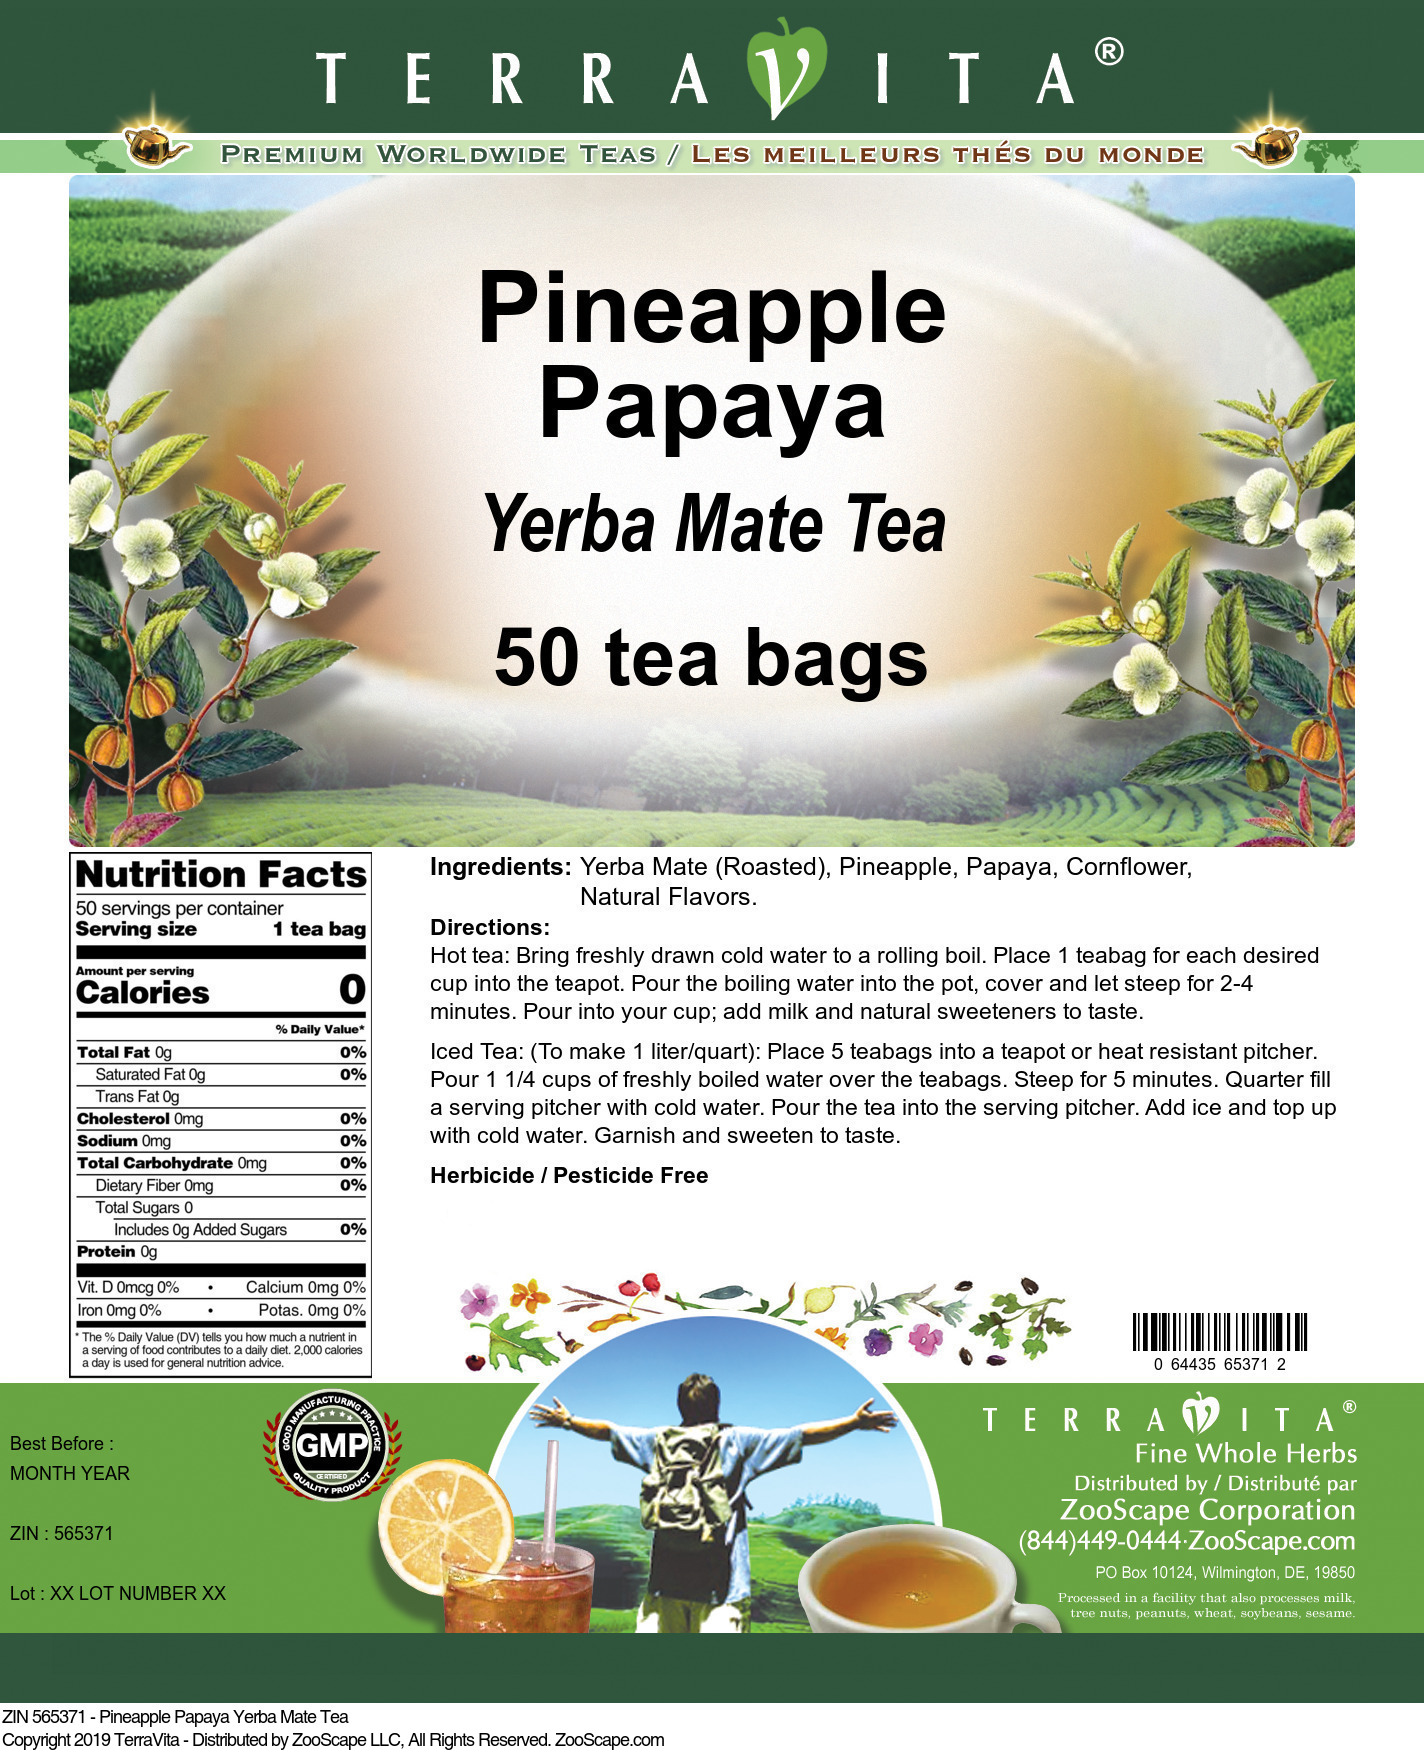 Pineapple Papaya Yerba Mate